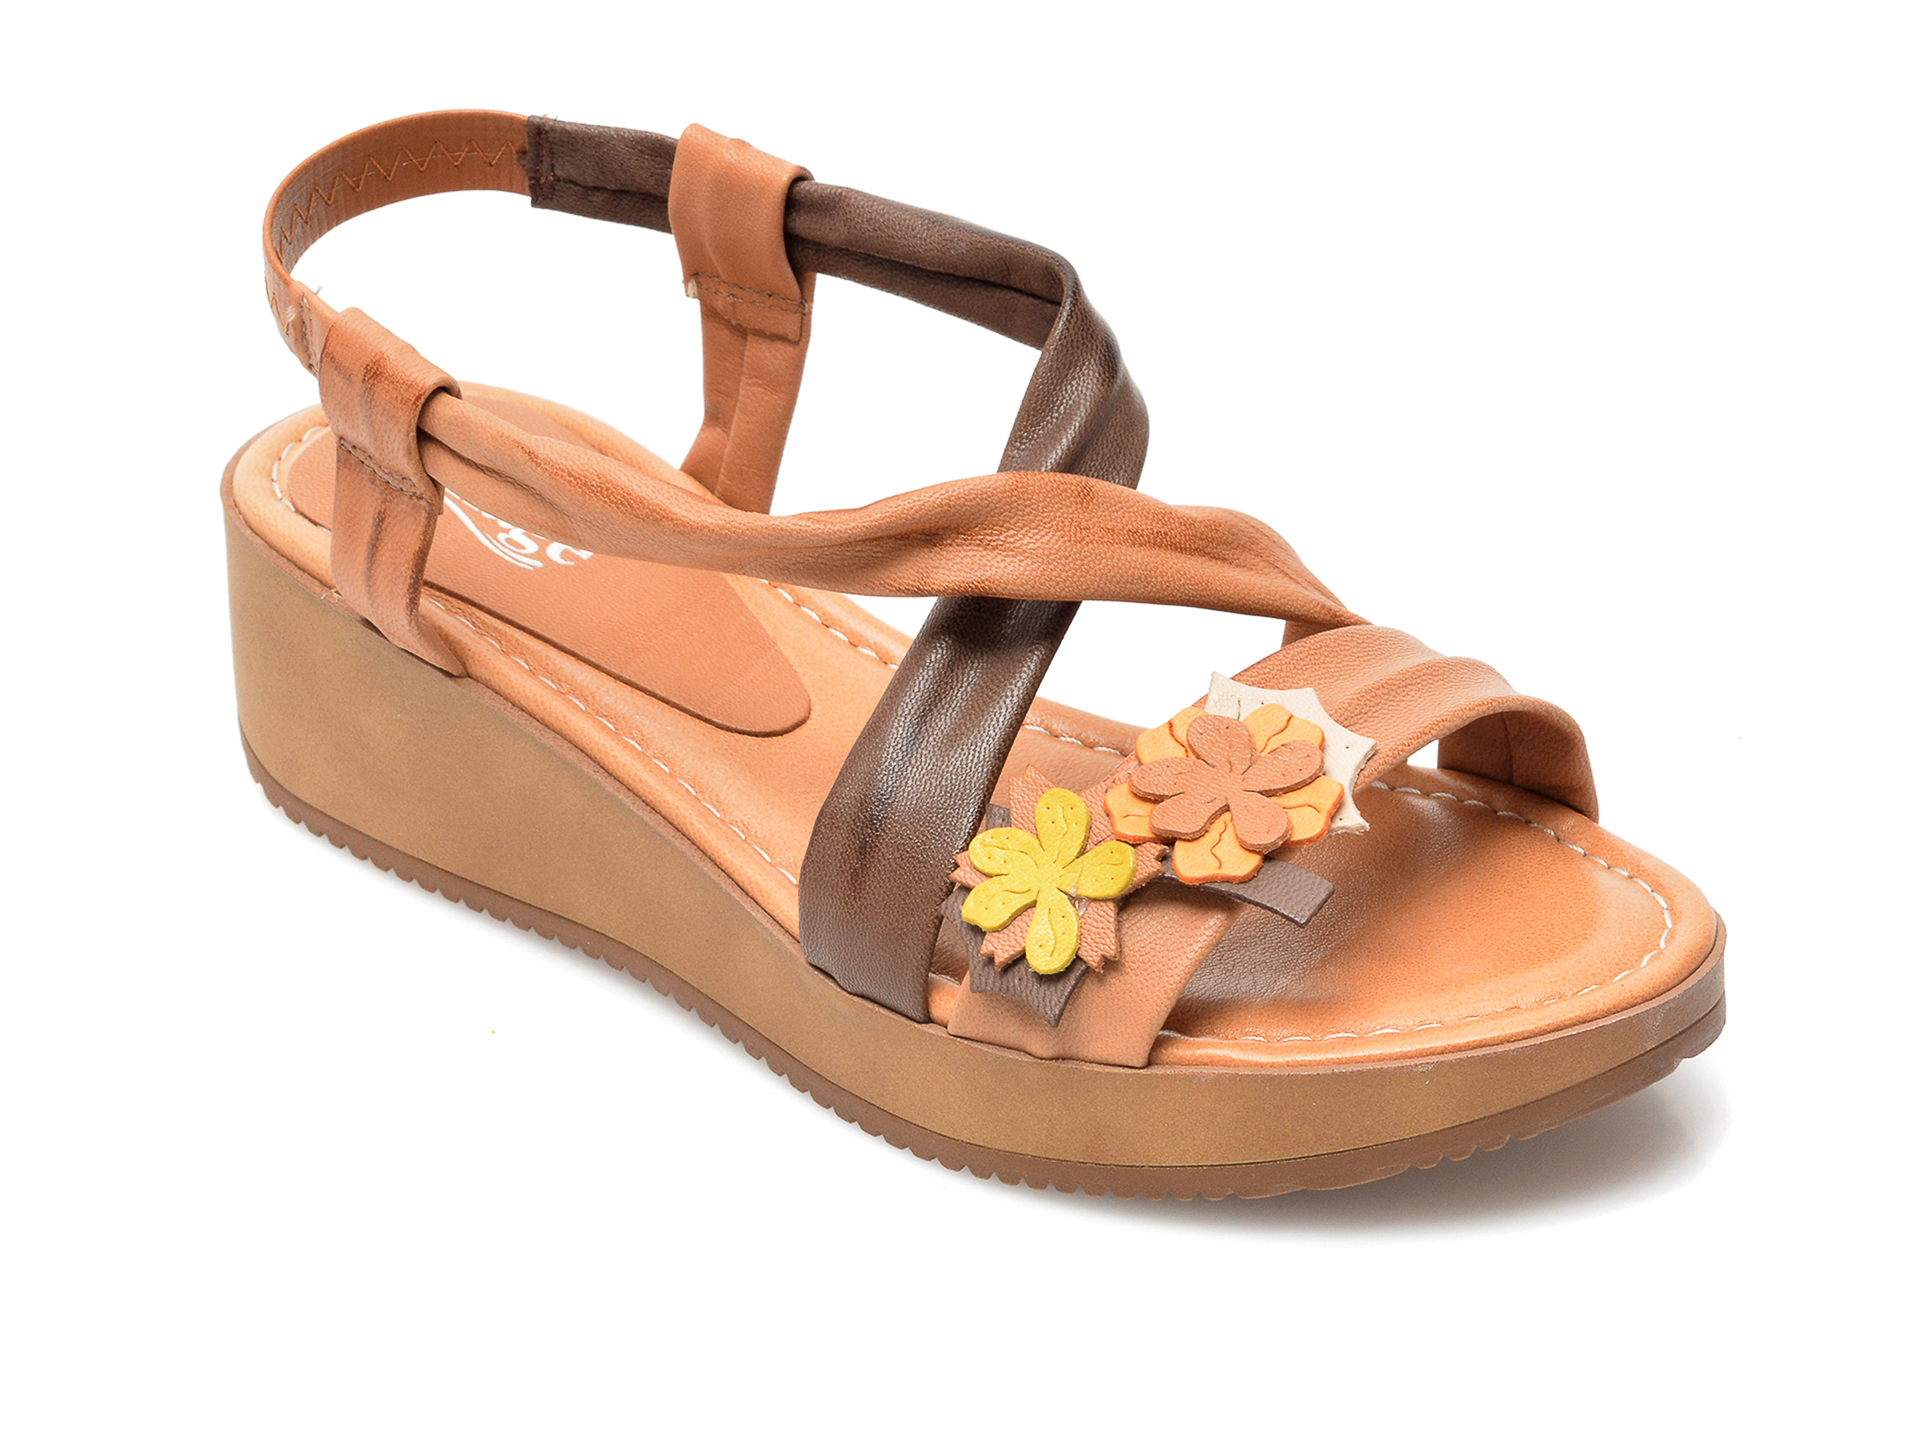 Sandale IMAGE maro, 1156LU, din piele naturala imagine otter.ro 2021